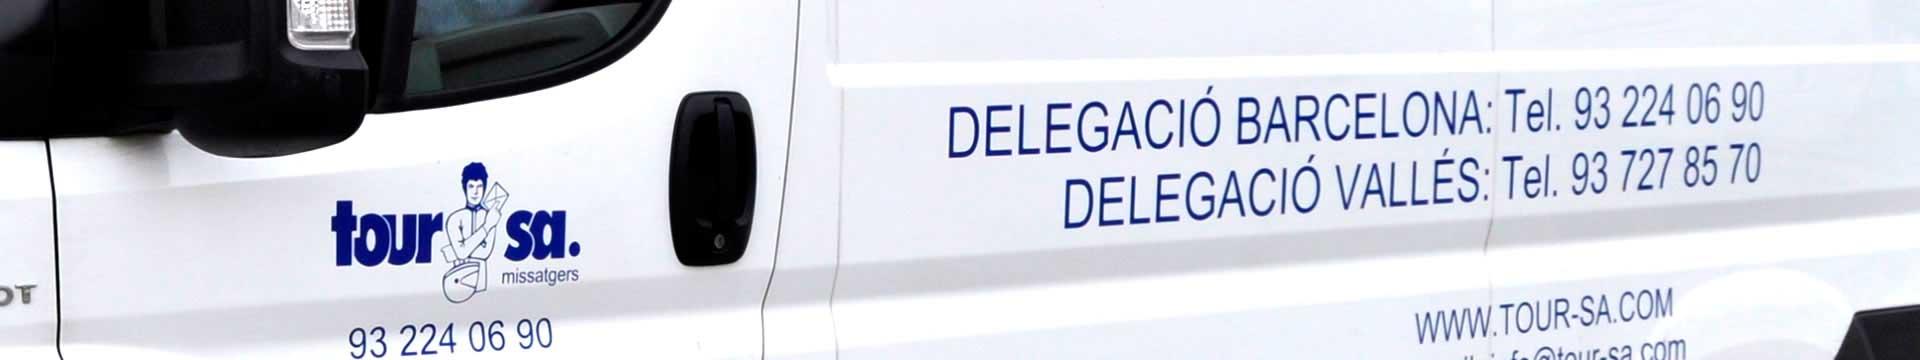 delegaciones Tour SA